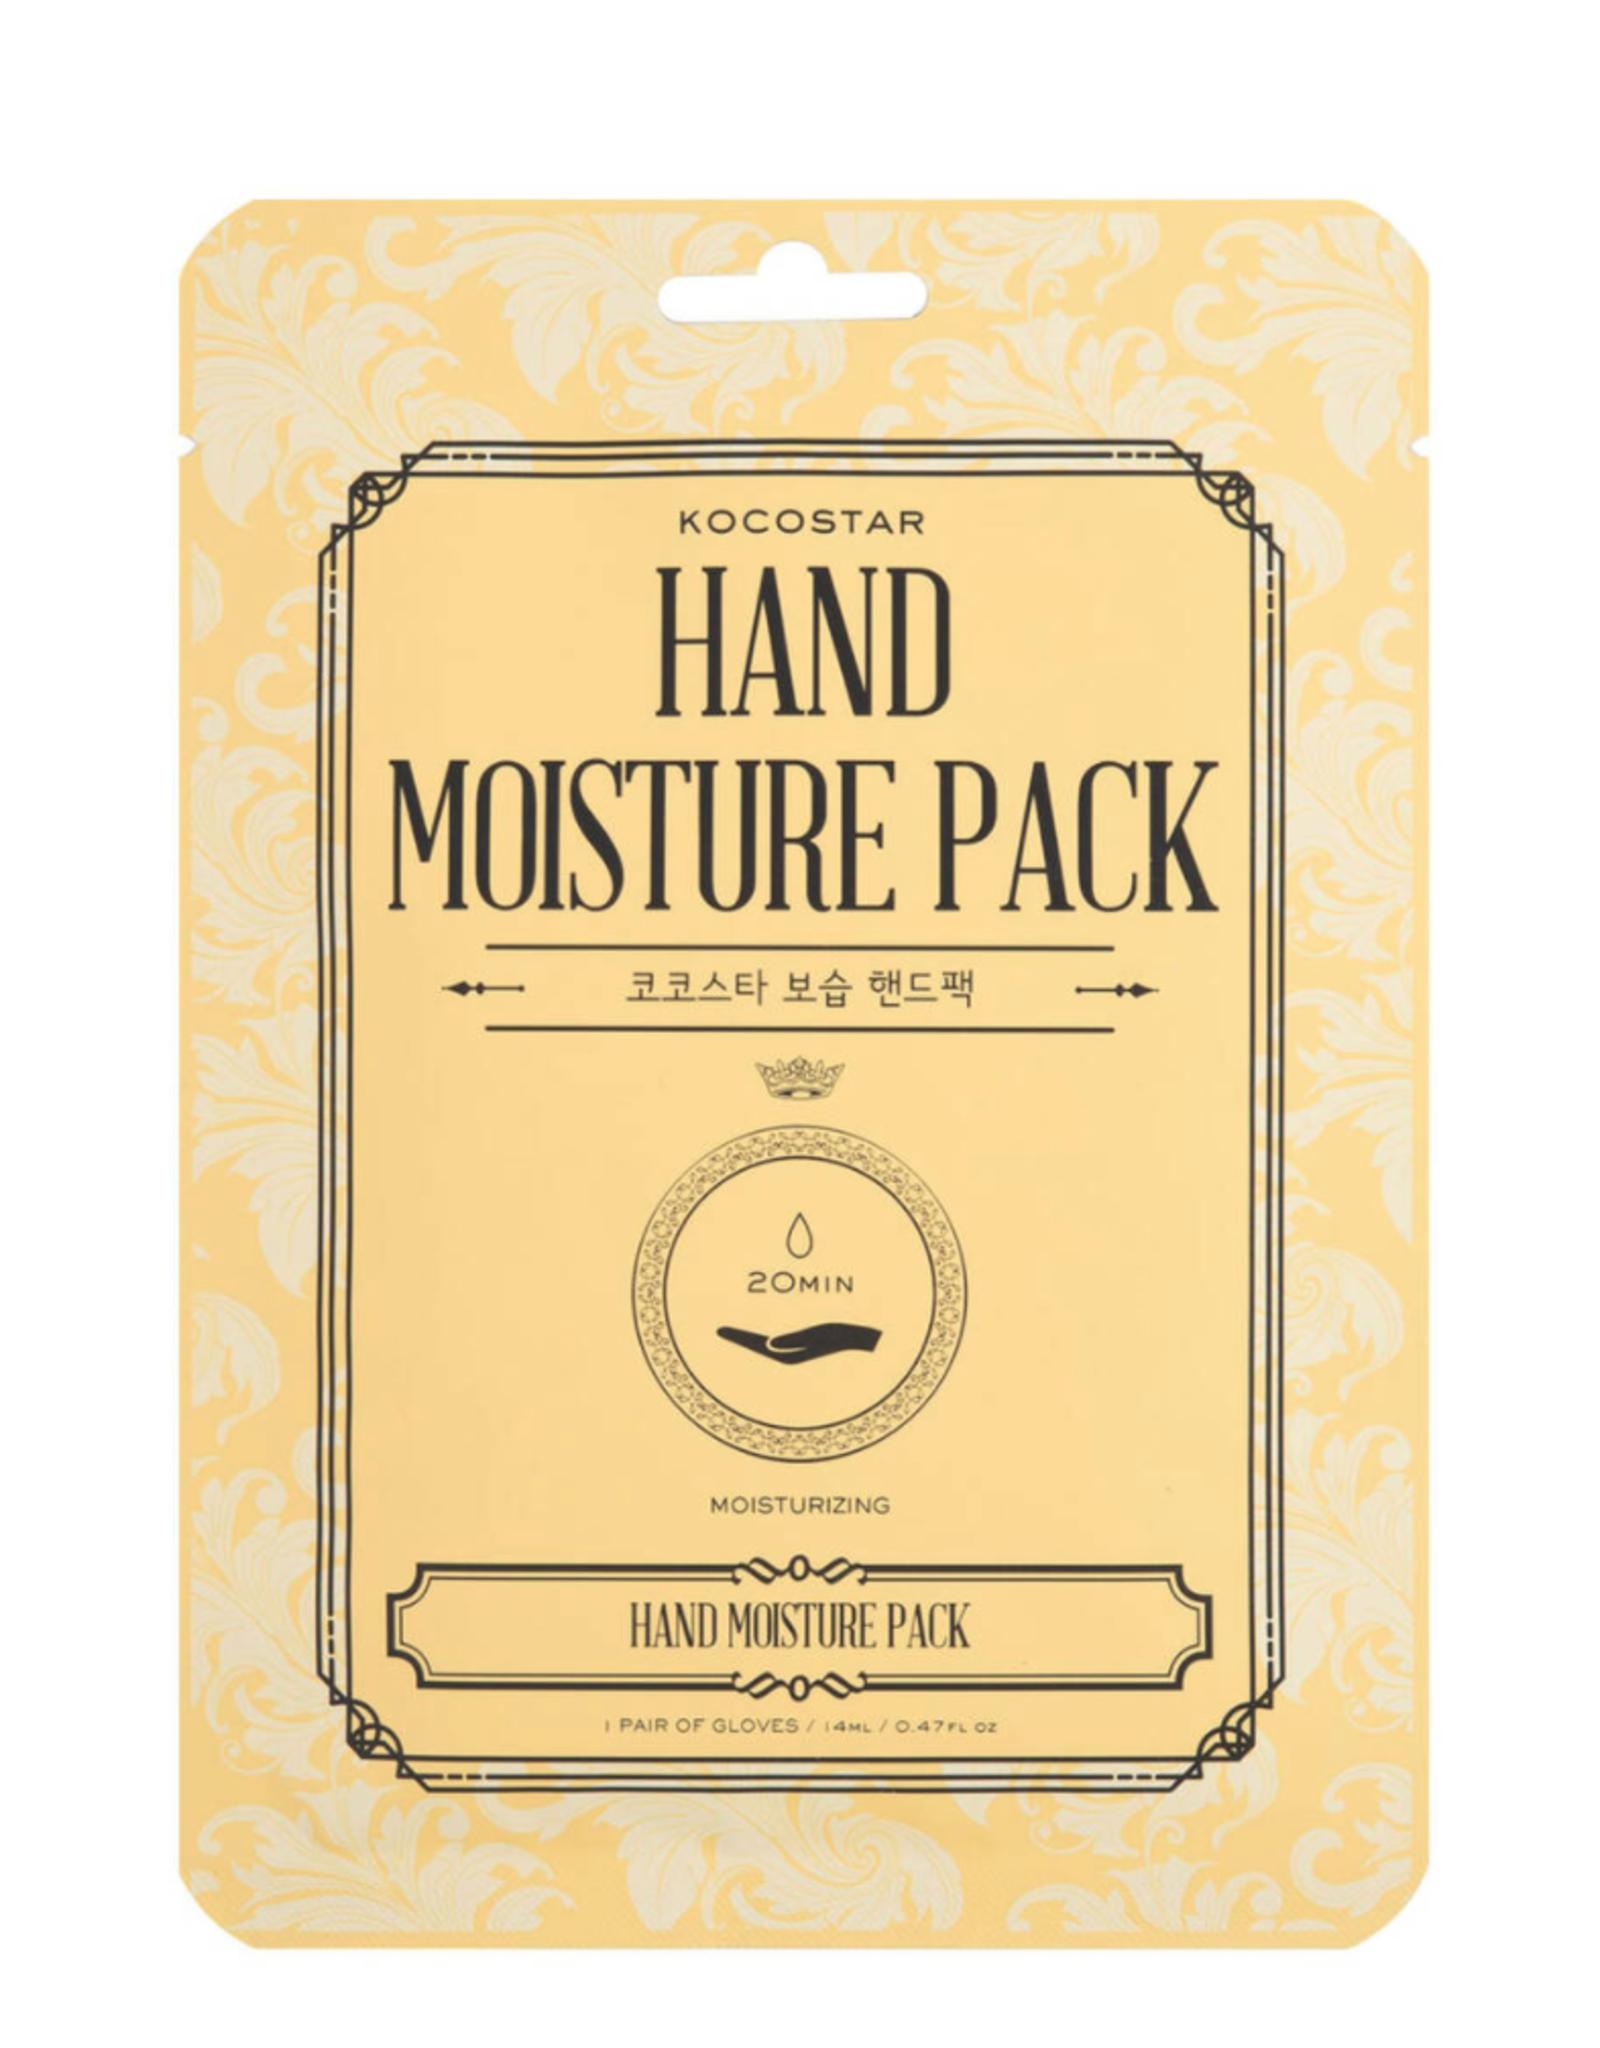 Hand Moisture Pack